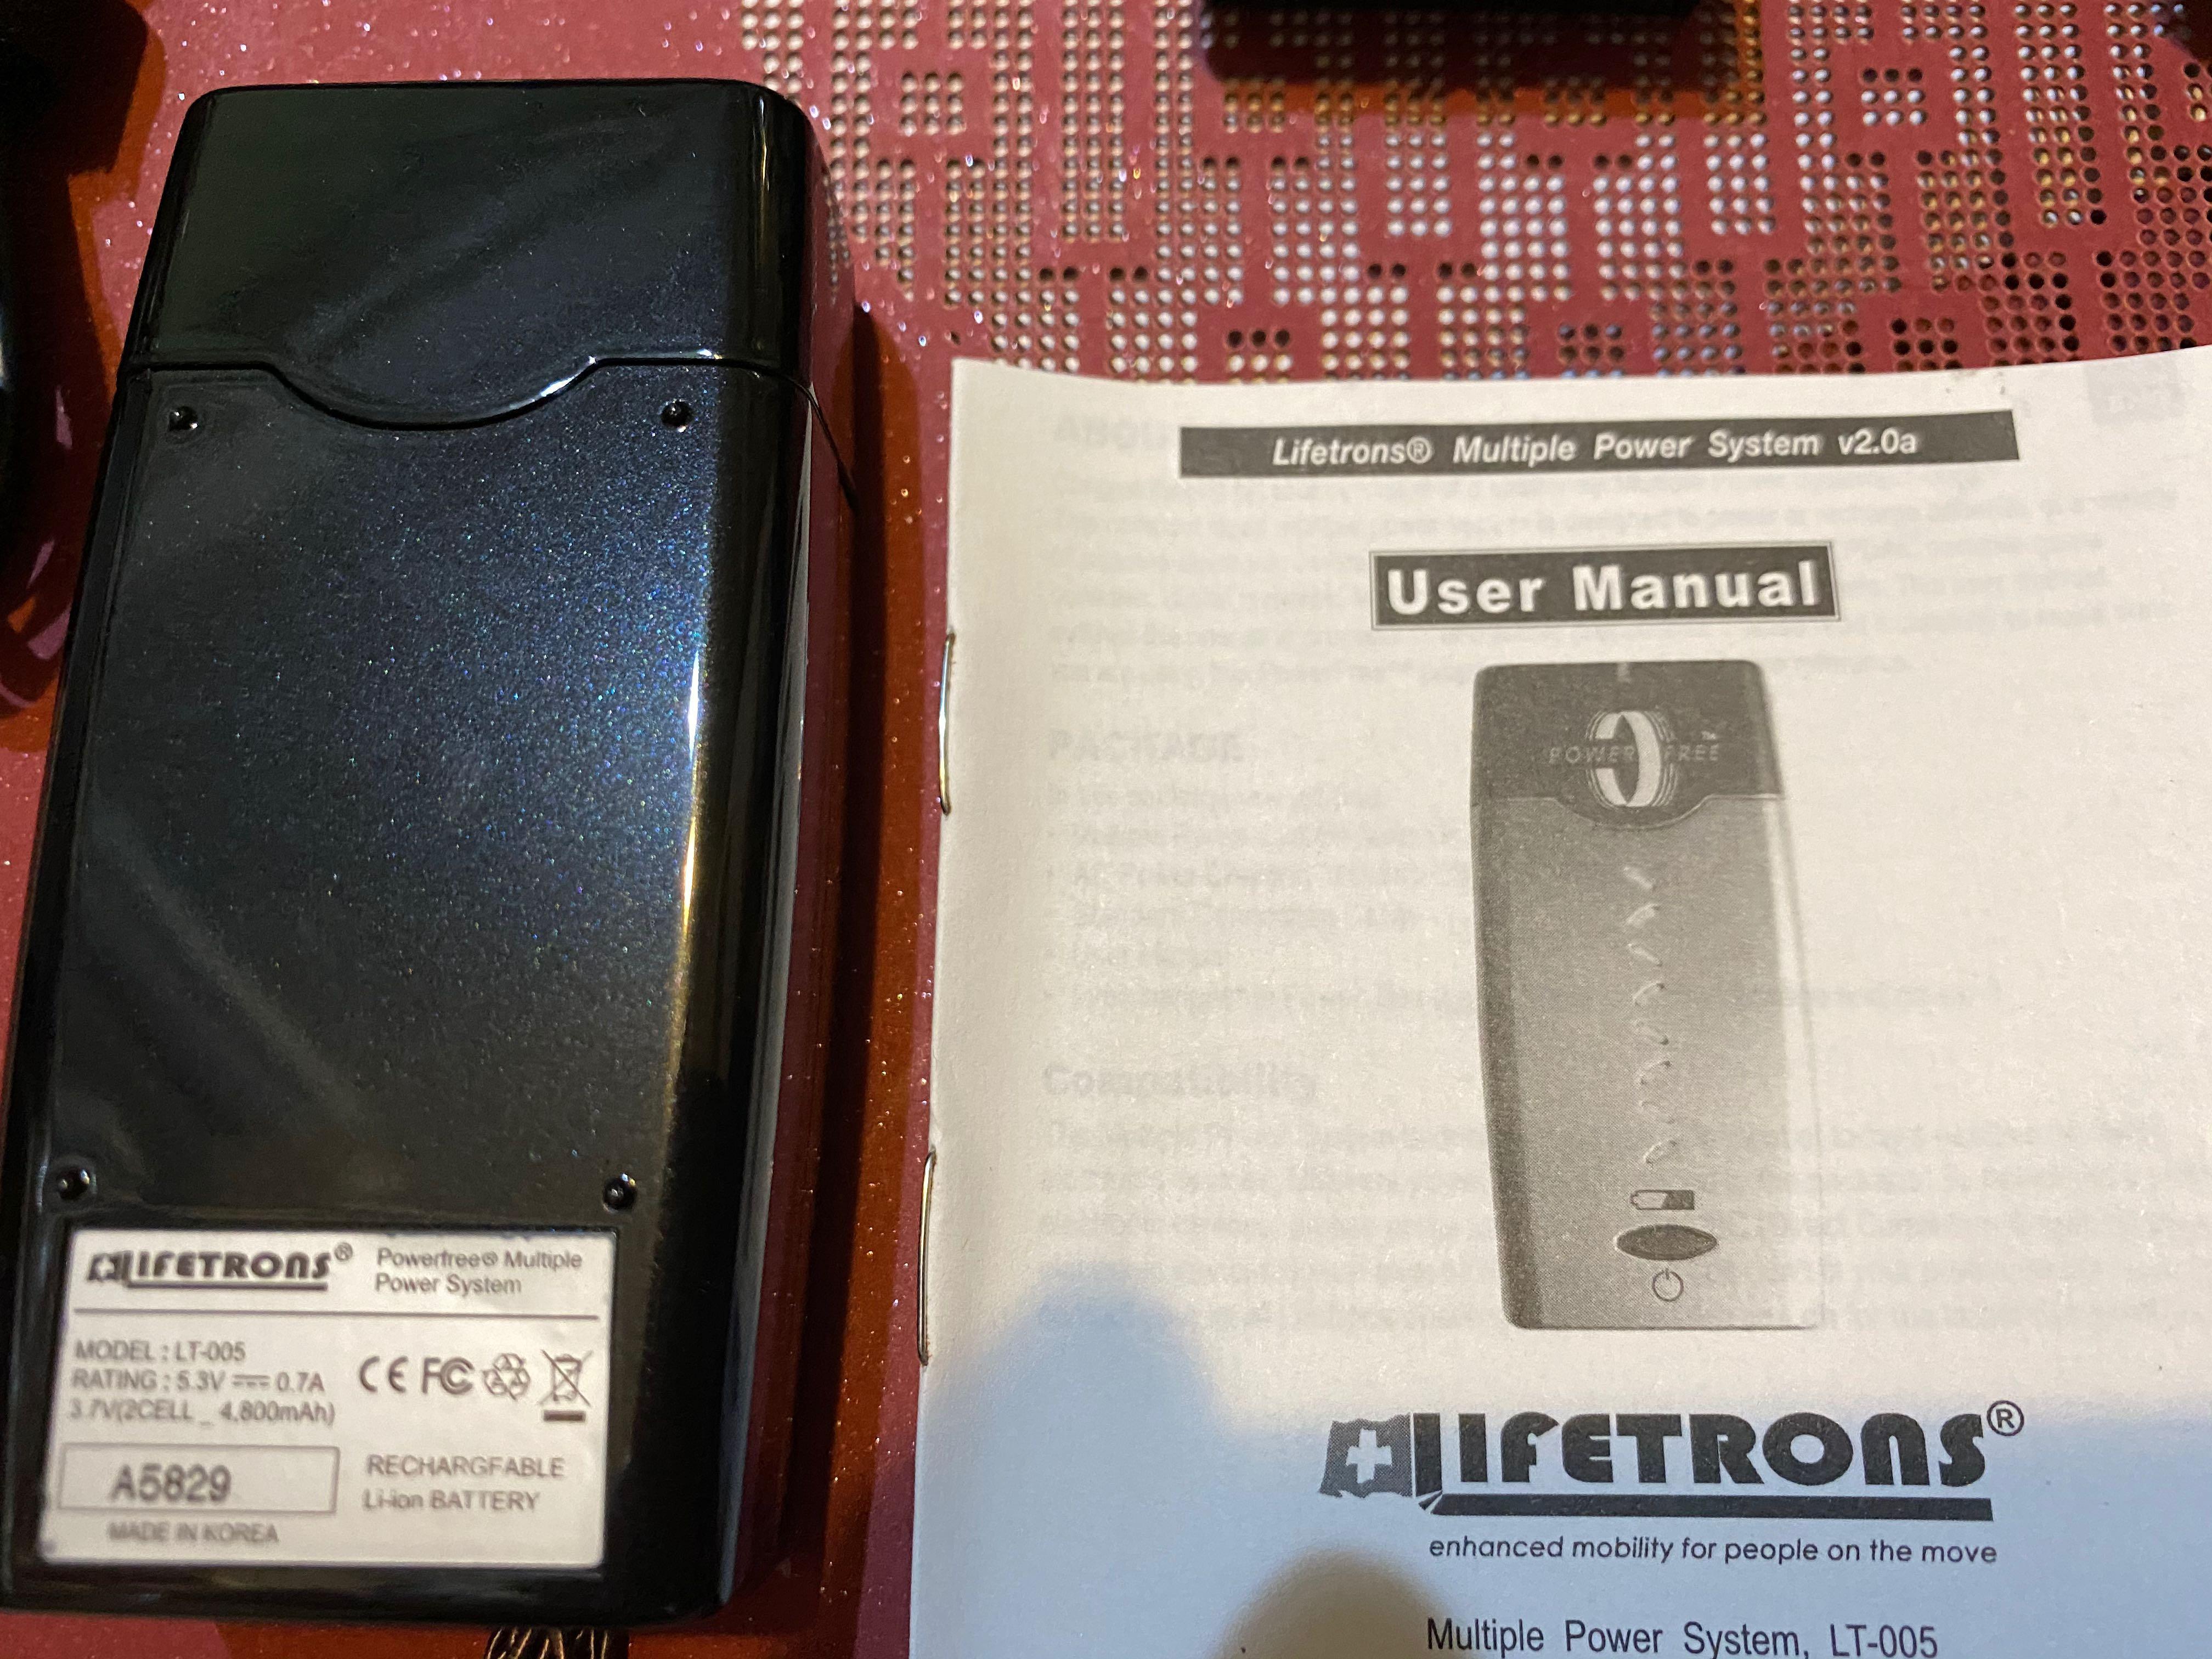 Lifetrons】瑞士牌多國萬用插頭